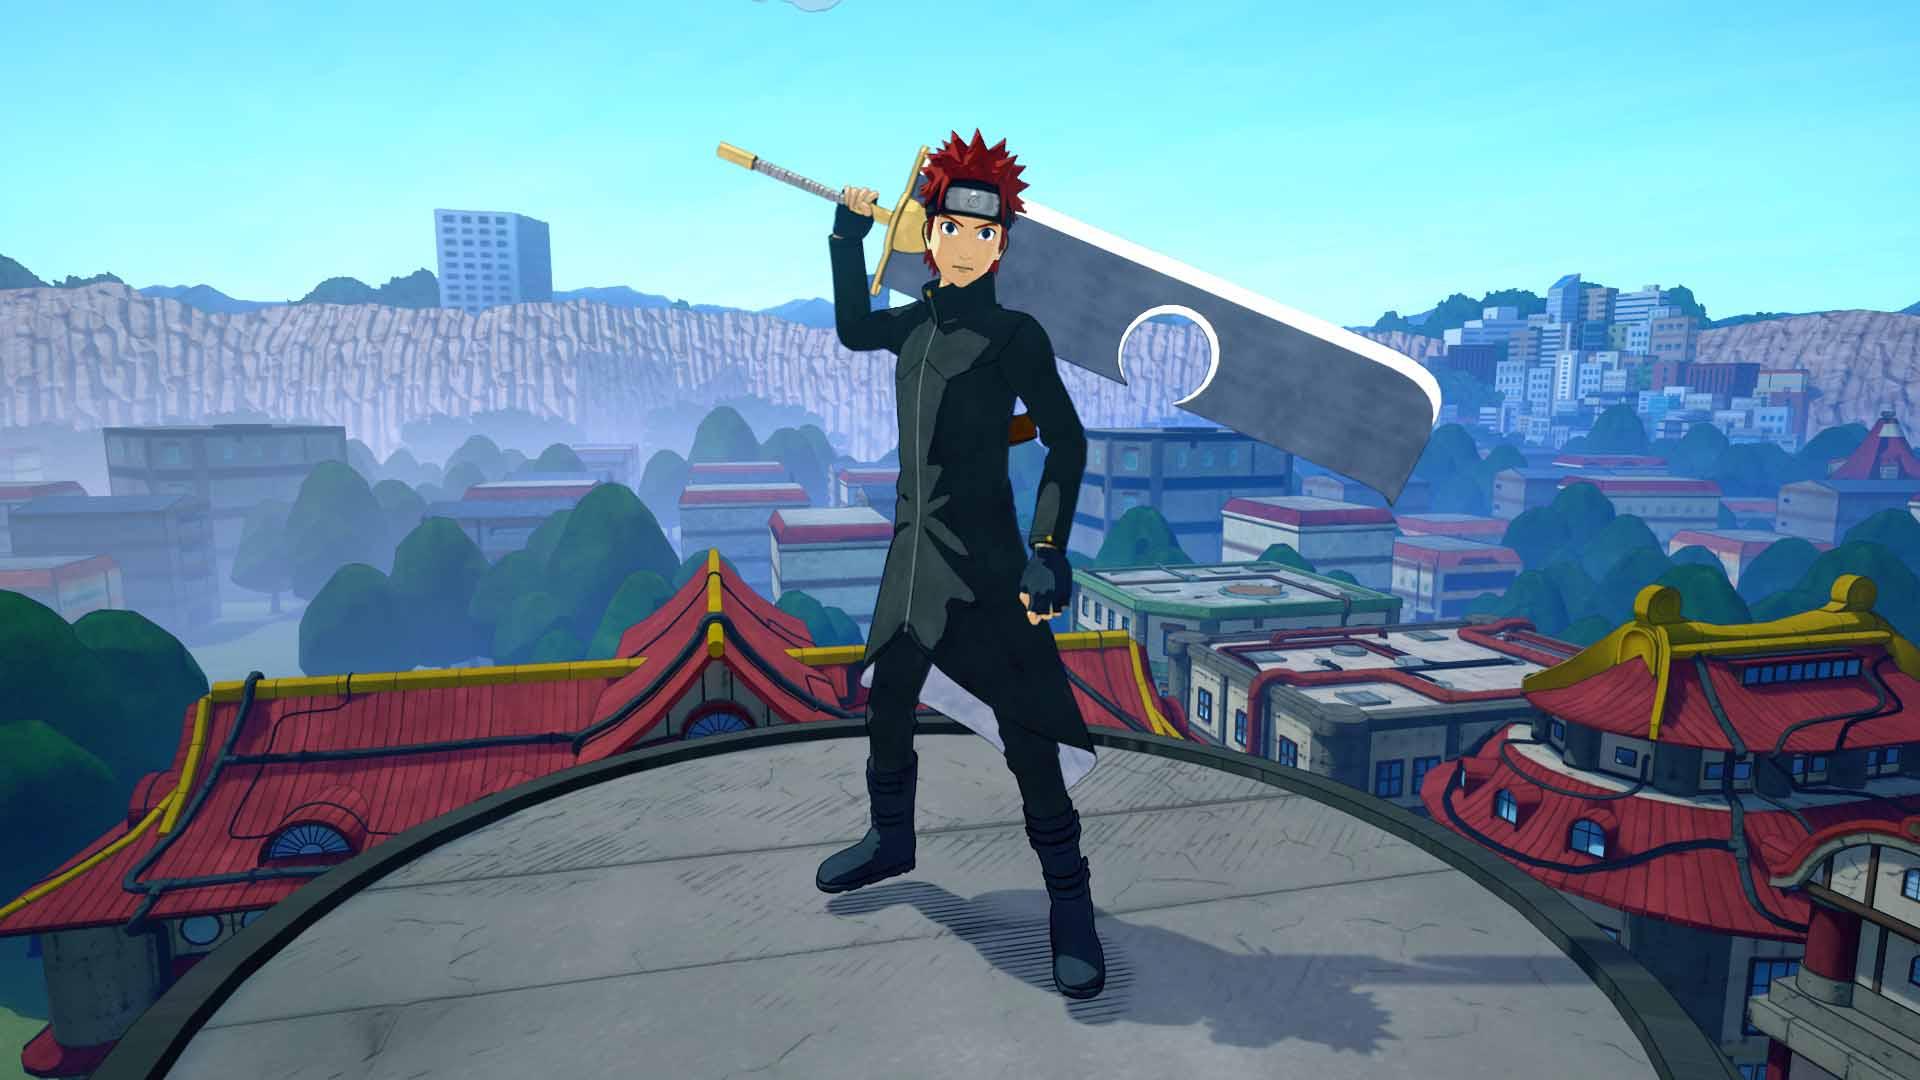 Naruto To Boruto : Shinobi Striker est disponible ! Plus d'infos sur Nipponzilla